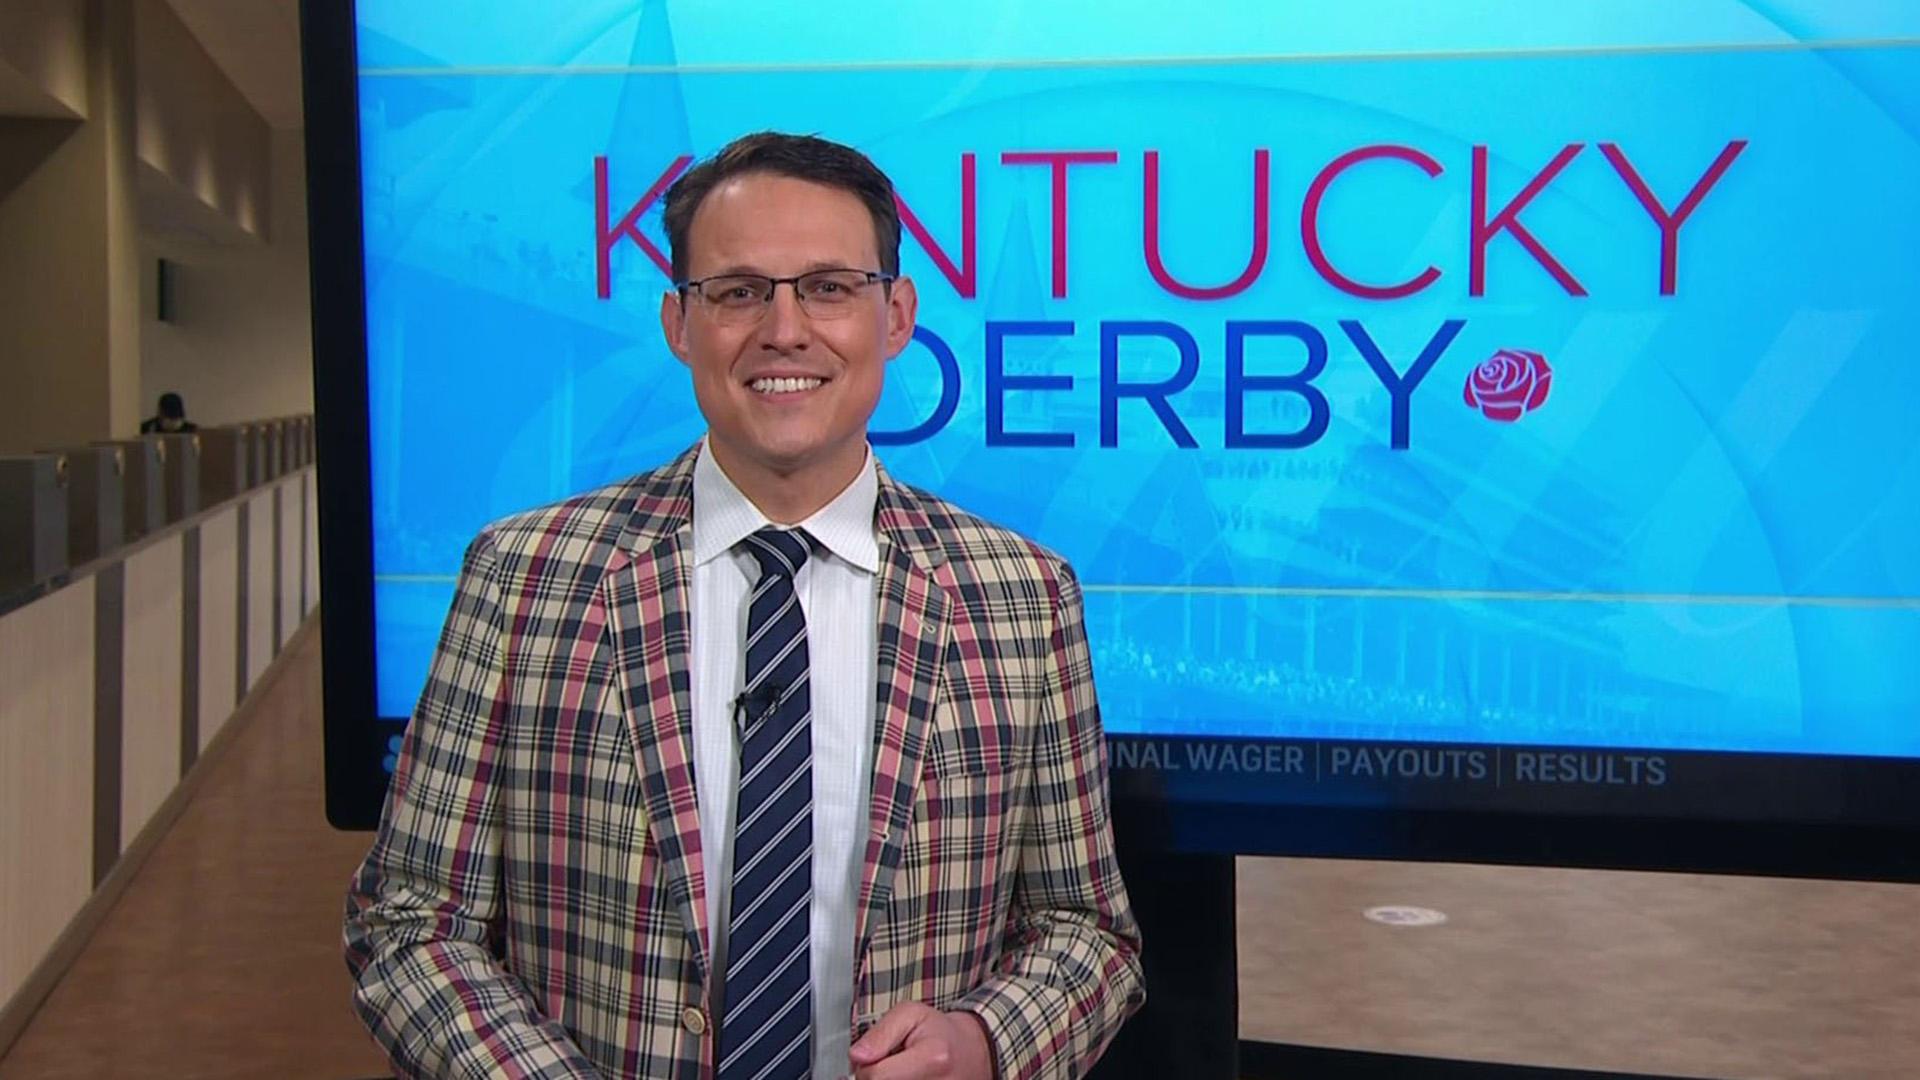 Kentucky Derby Steve Kornacki predicts winner